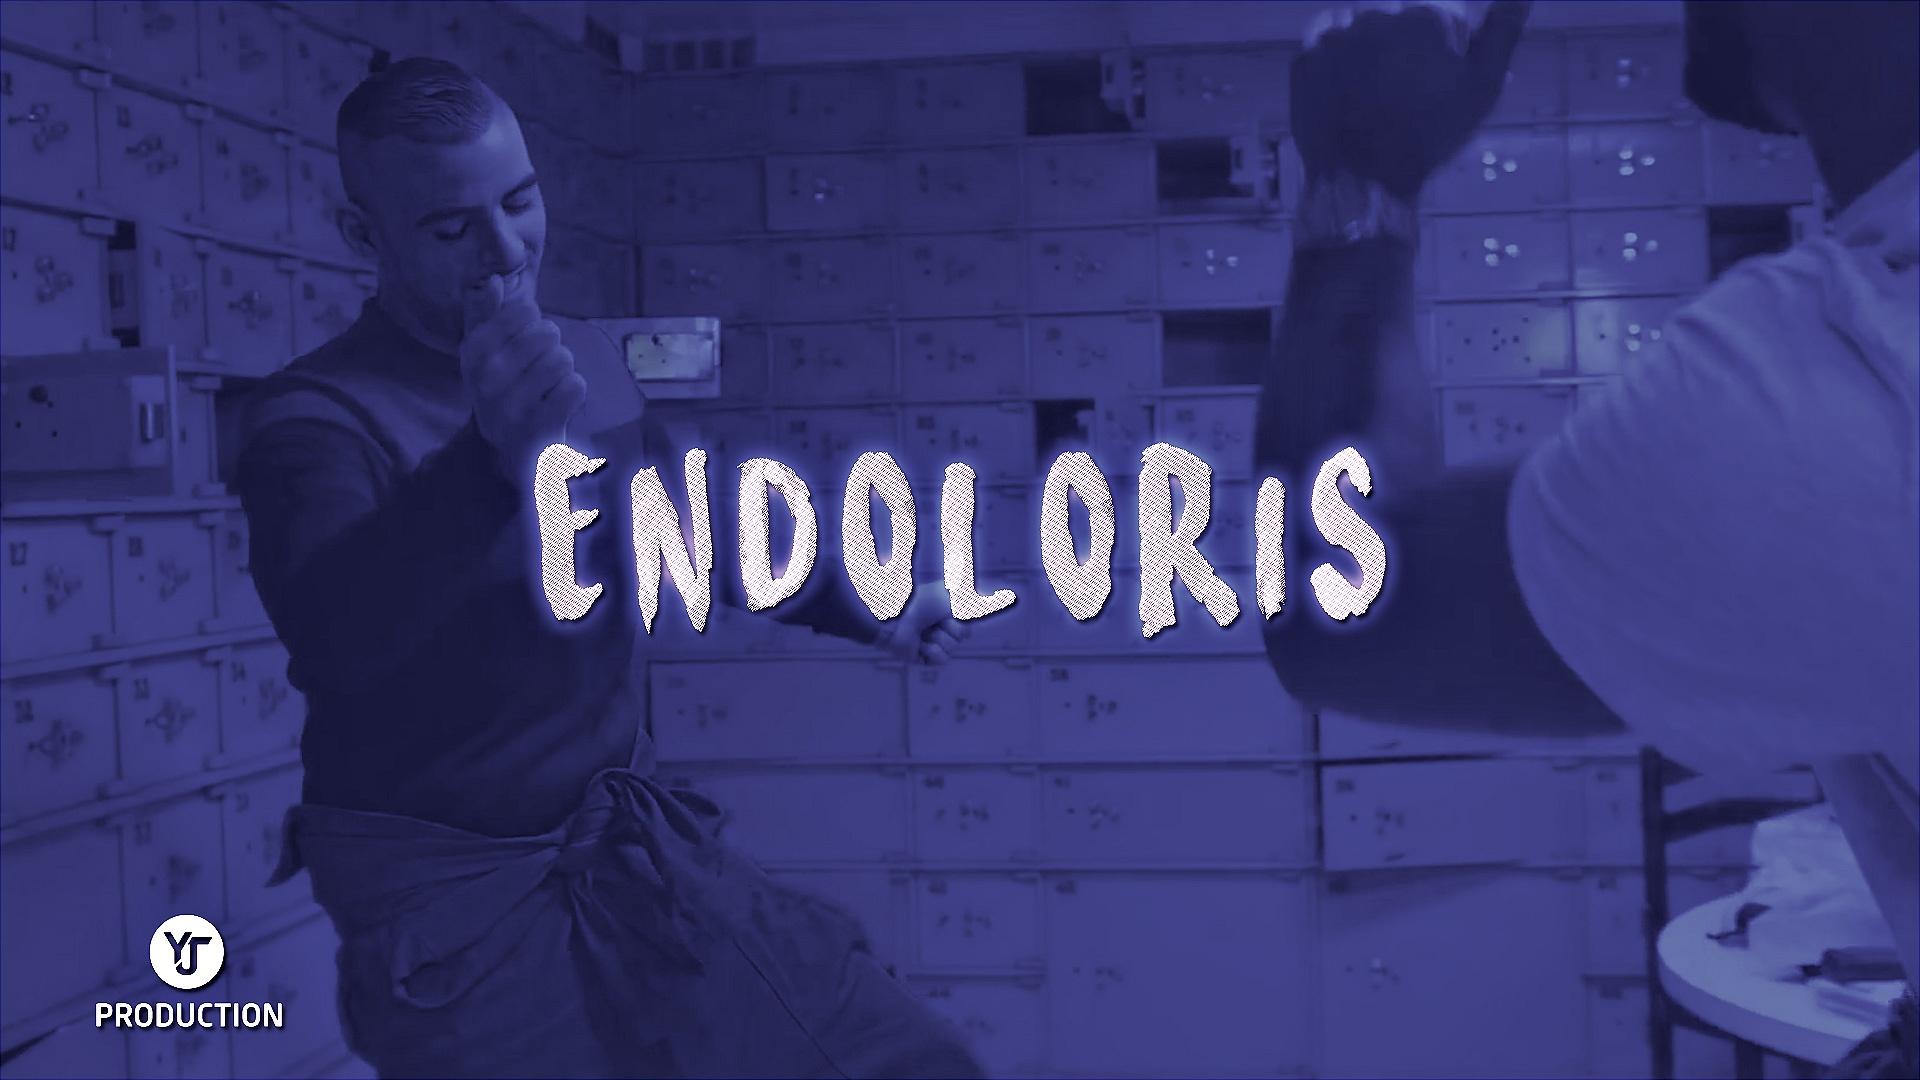 [FREE] ENDOLORIS | YJ Production